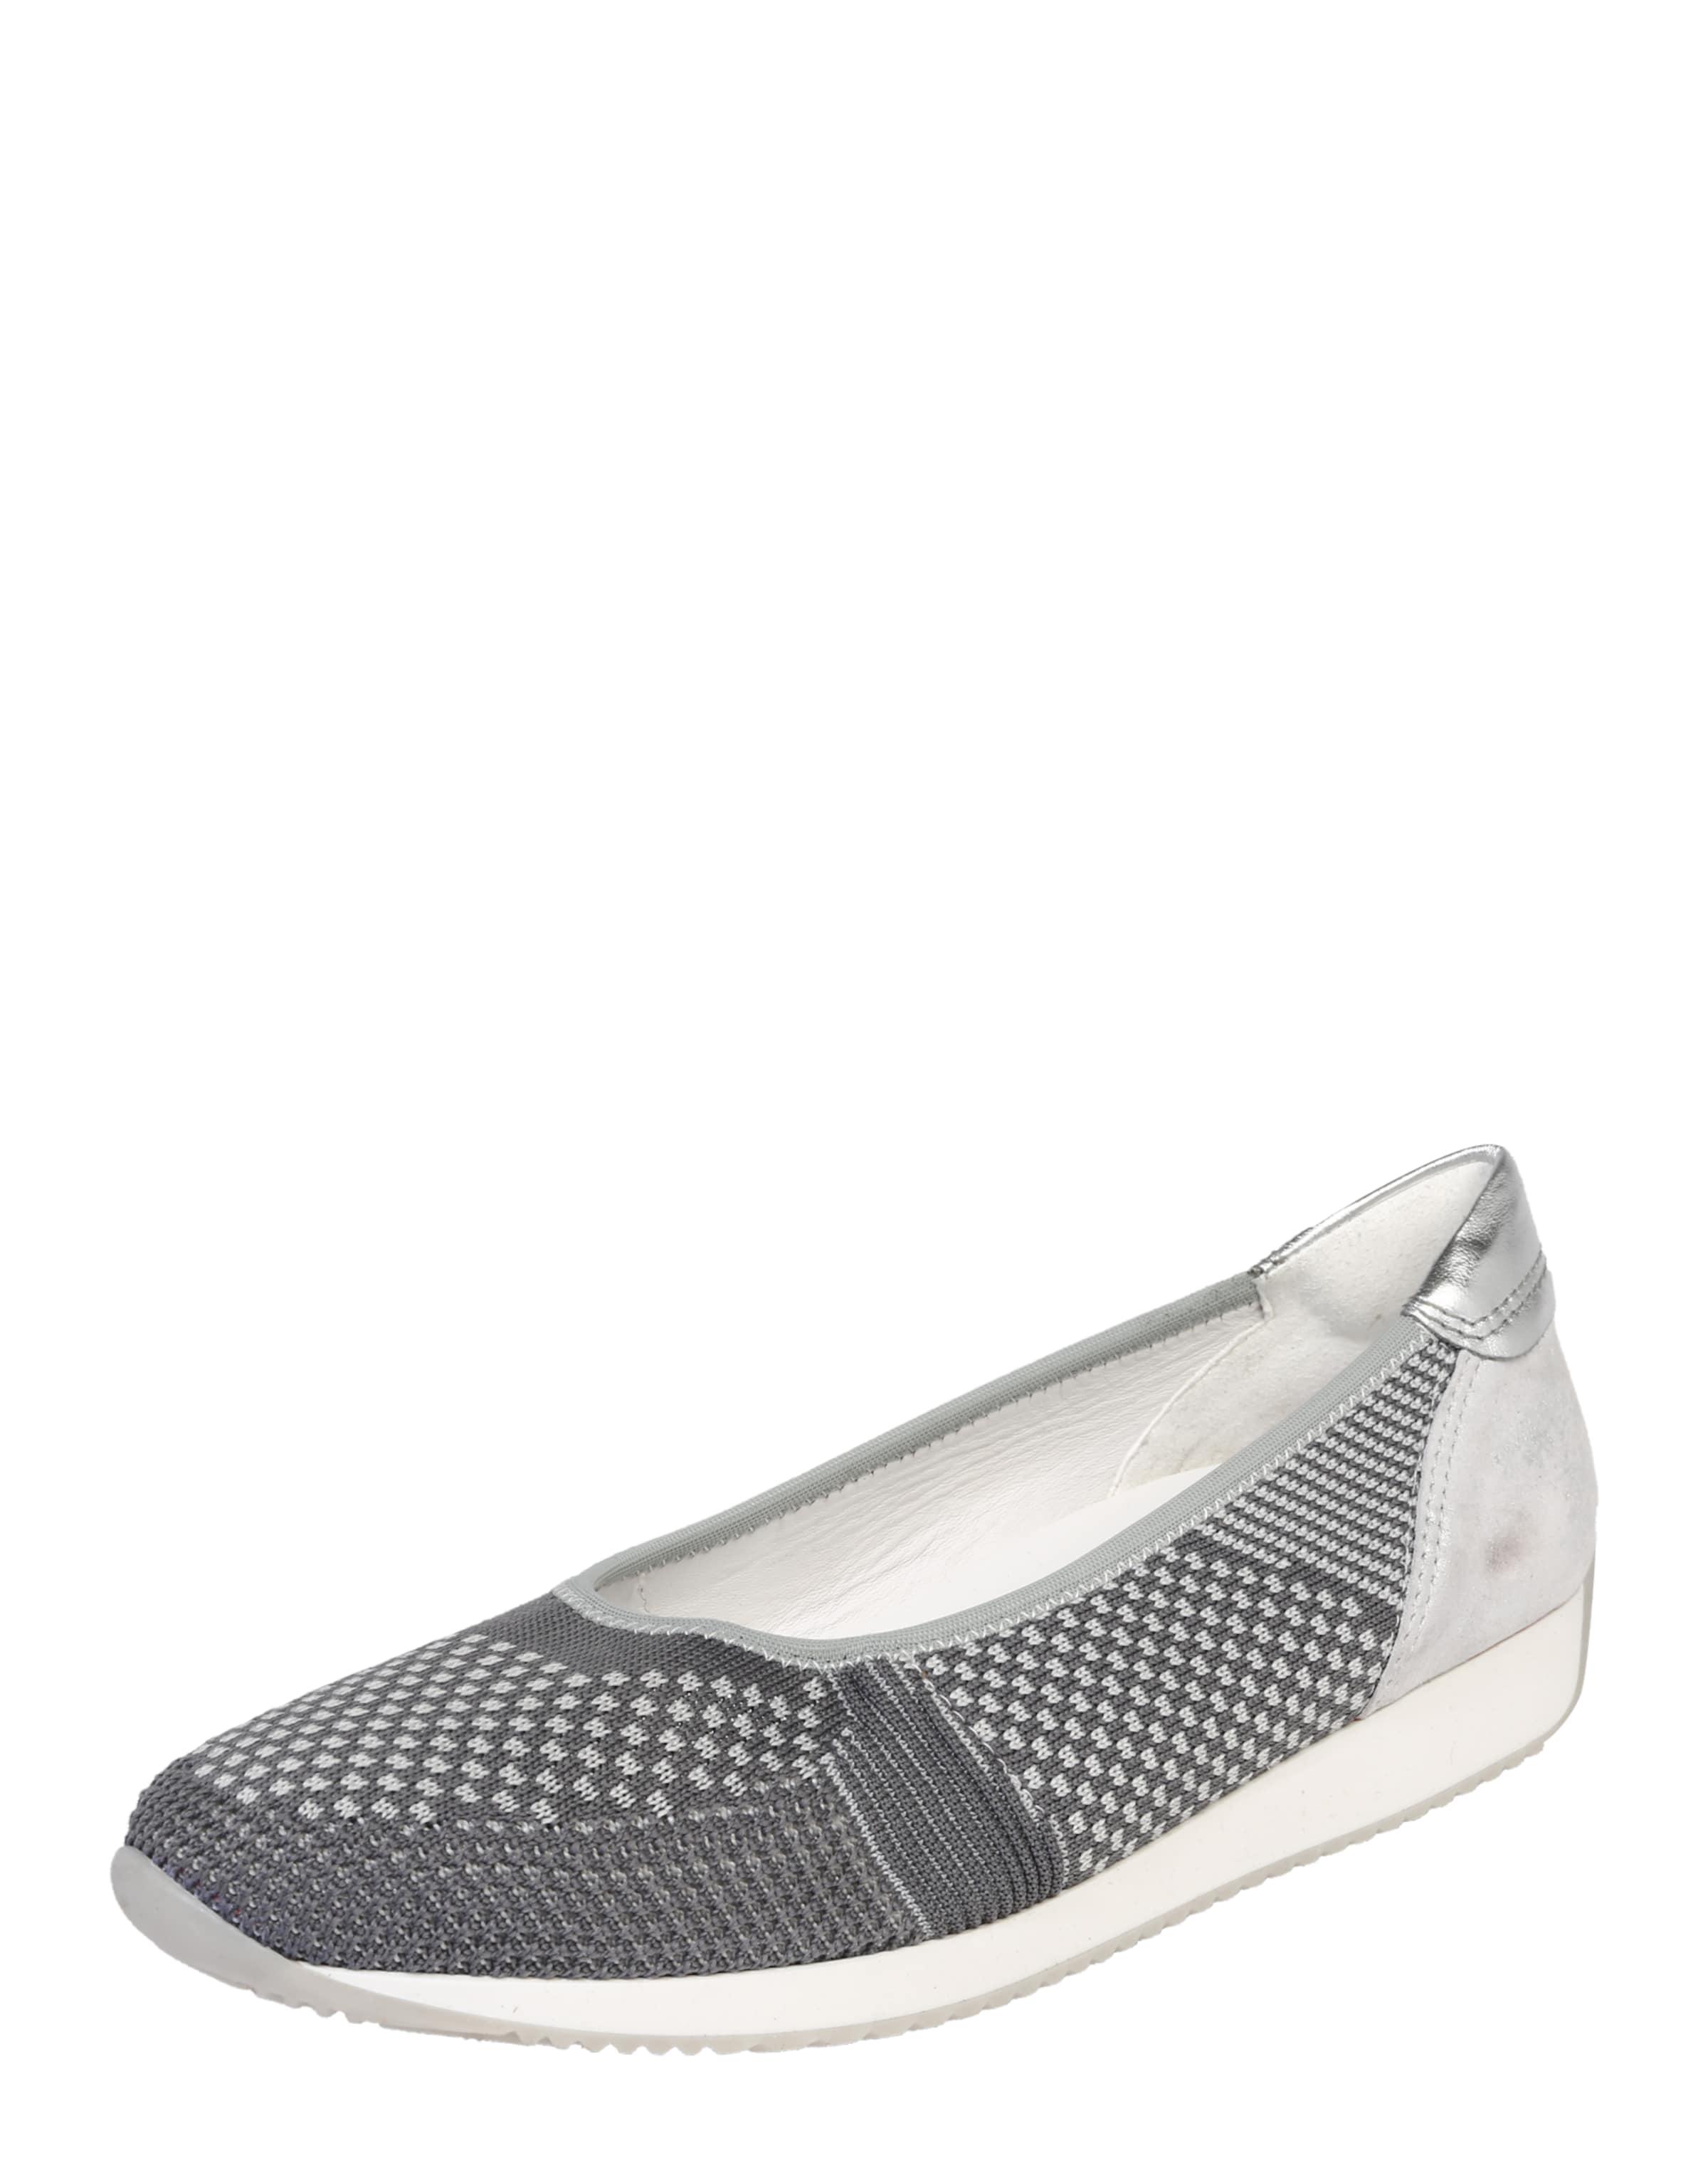 ARA | Ballerinas 'Porto-Fusion4' mit Dynergy-Sohle Schuhe Gut getragene Schuhe